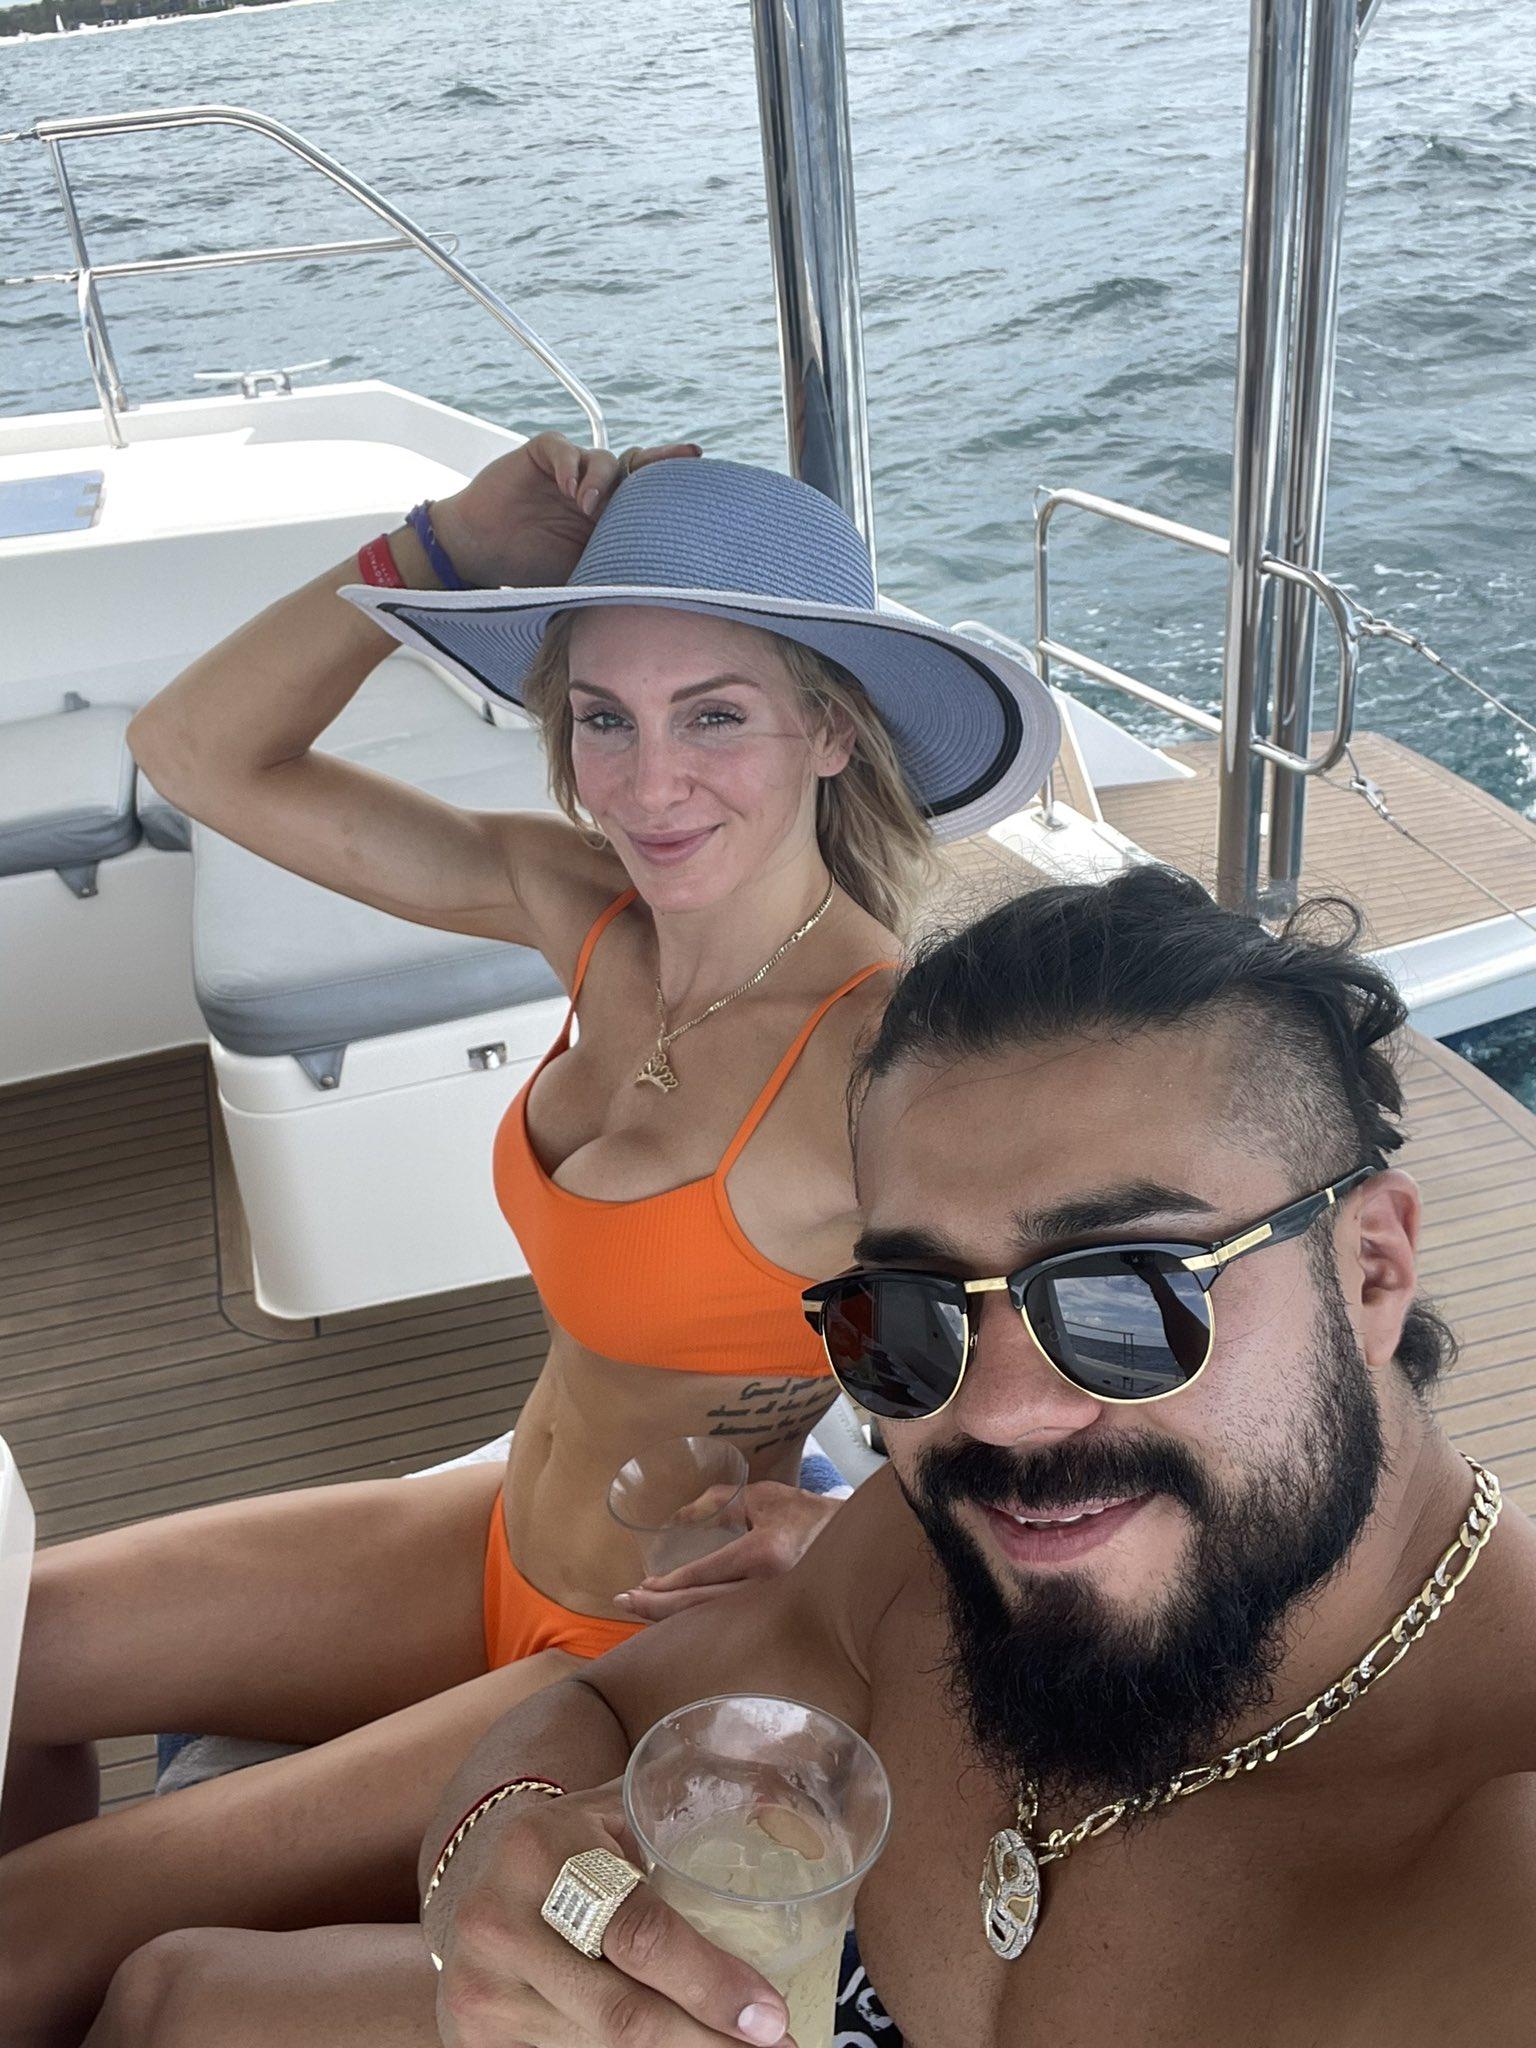 Photos: WWE Star Charlotte Flair Shares Bikini Spam From Latest Vacation 1